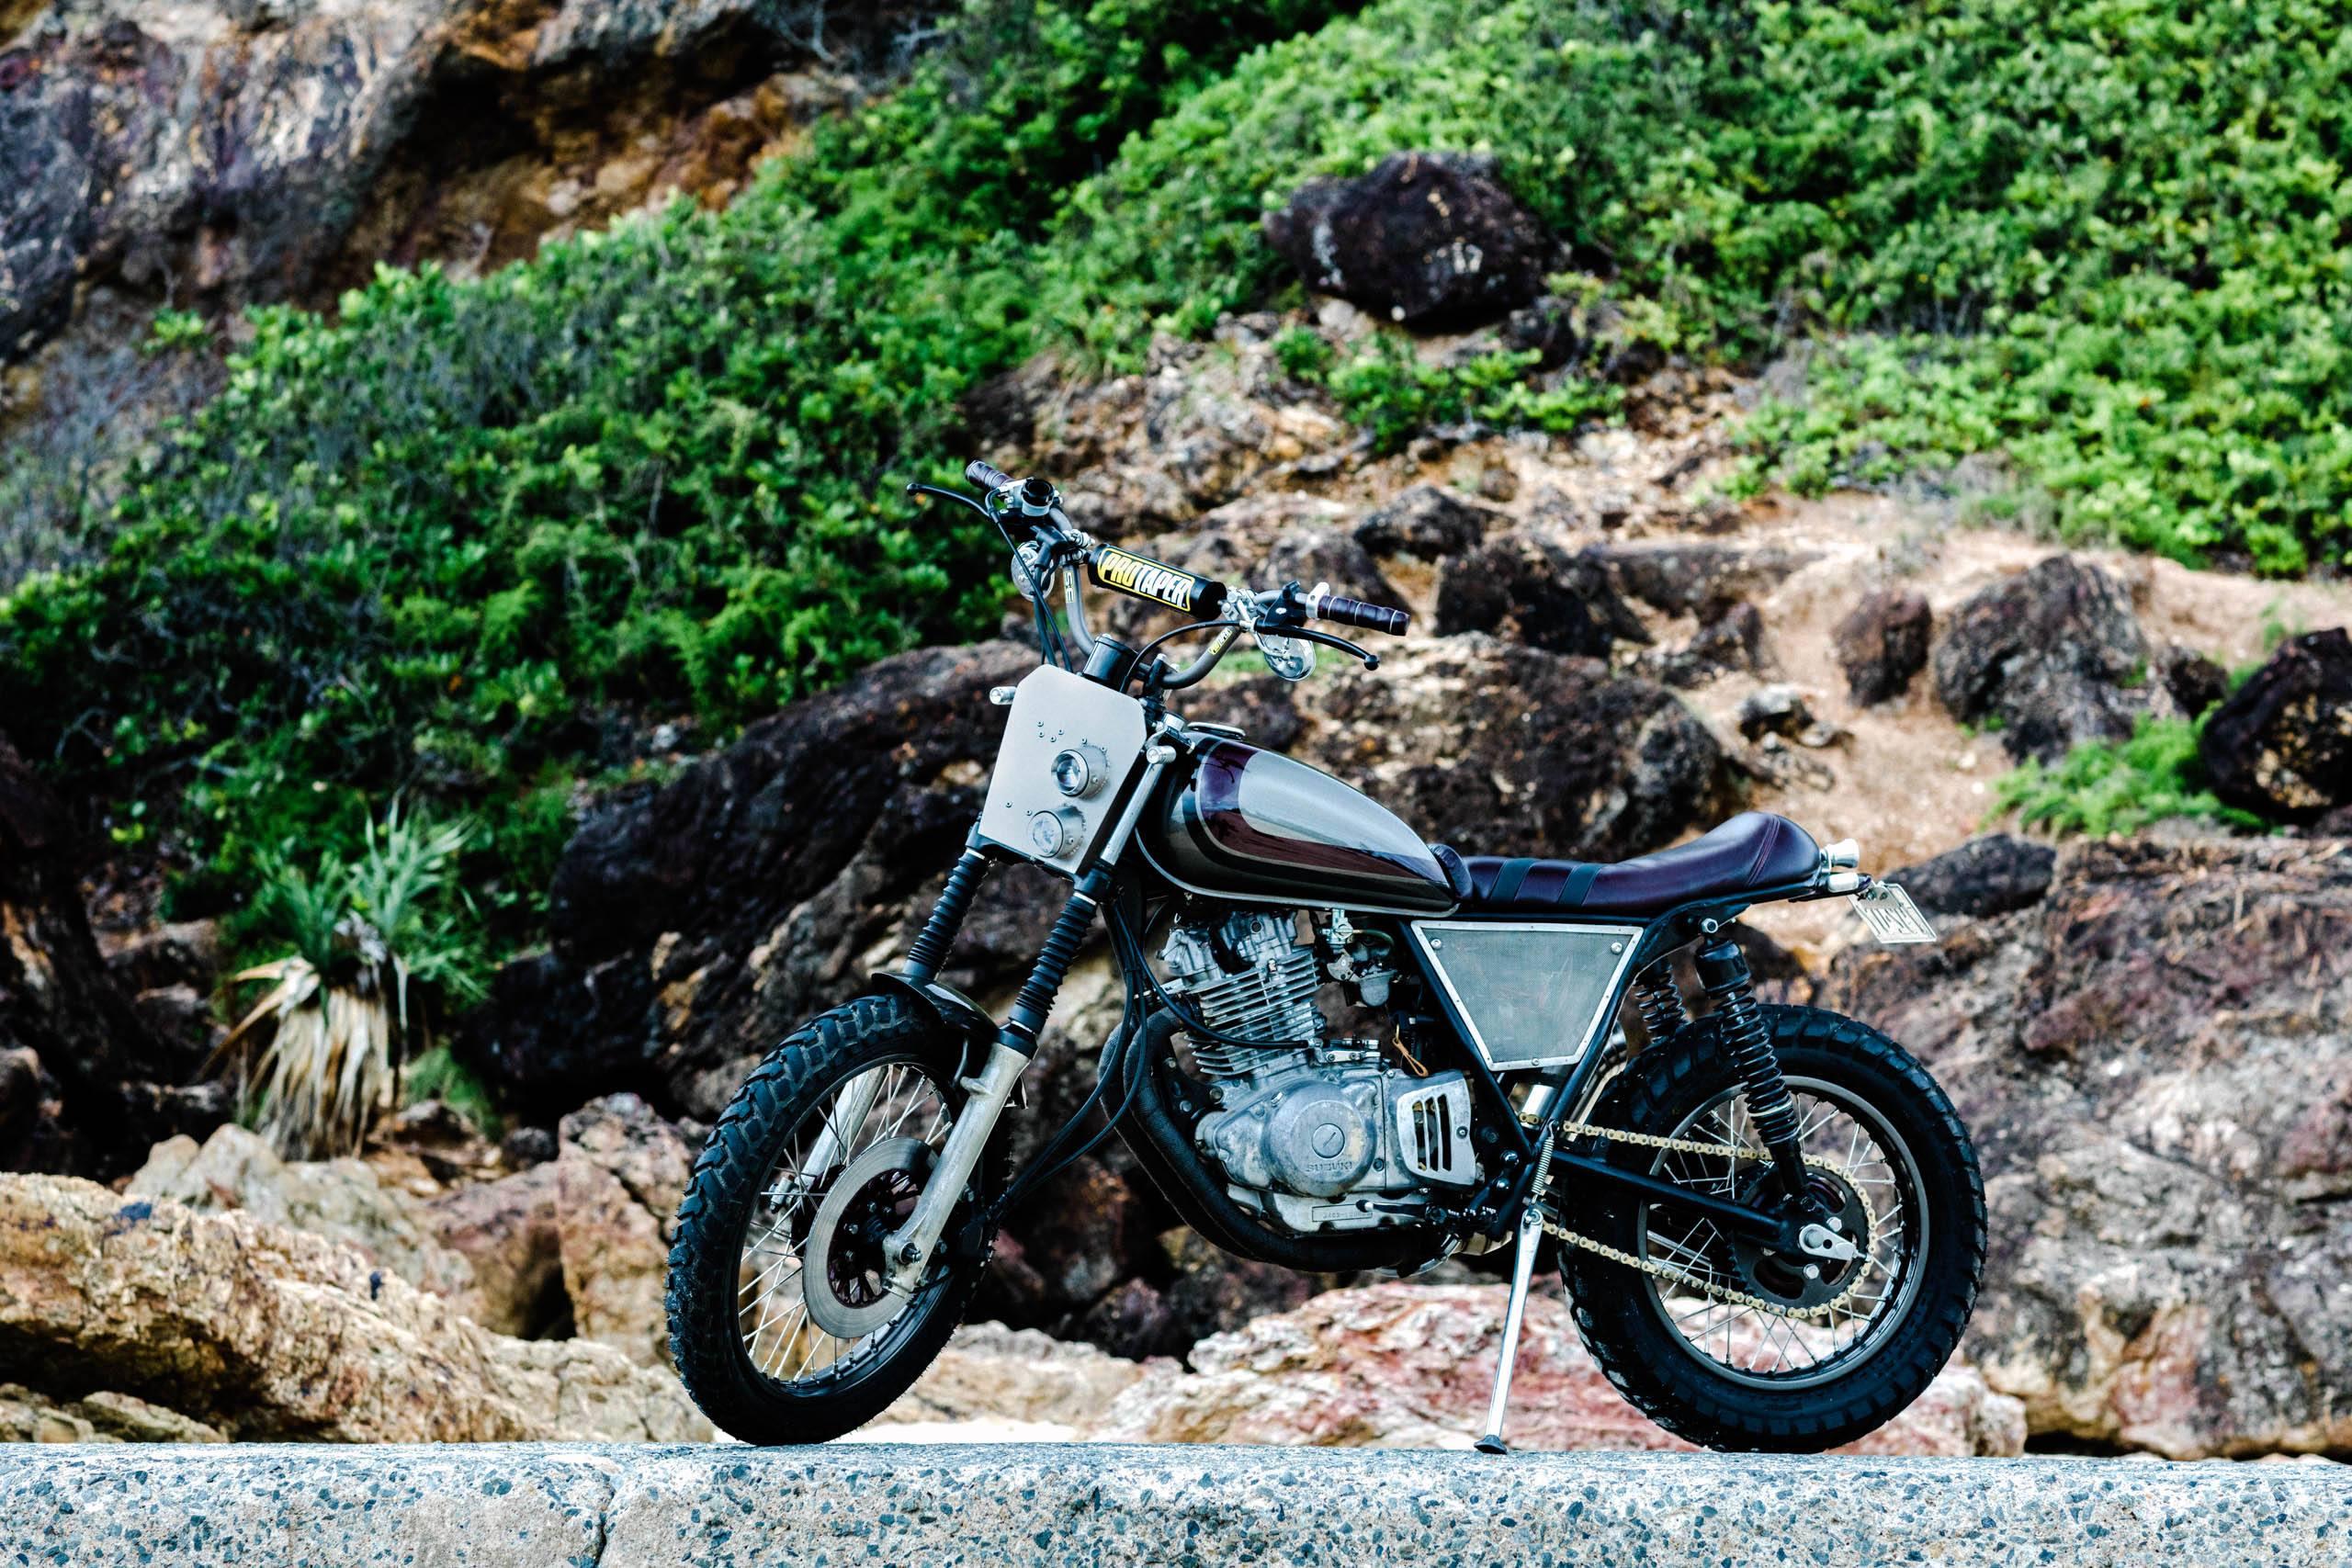 Suzuki Scrambler GN250 Scrambler headlight